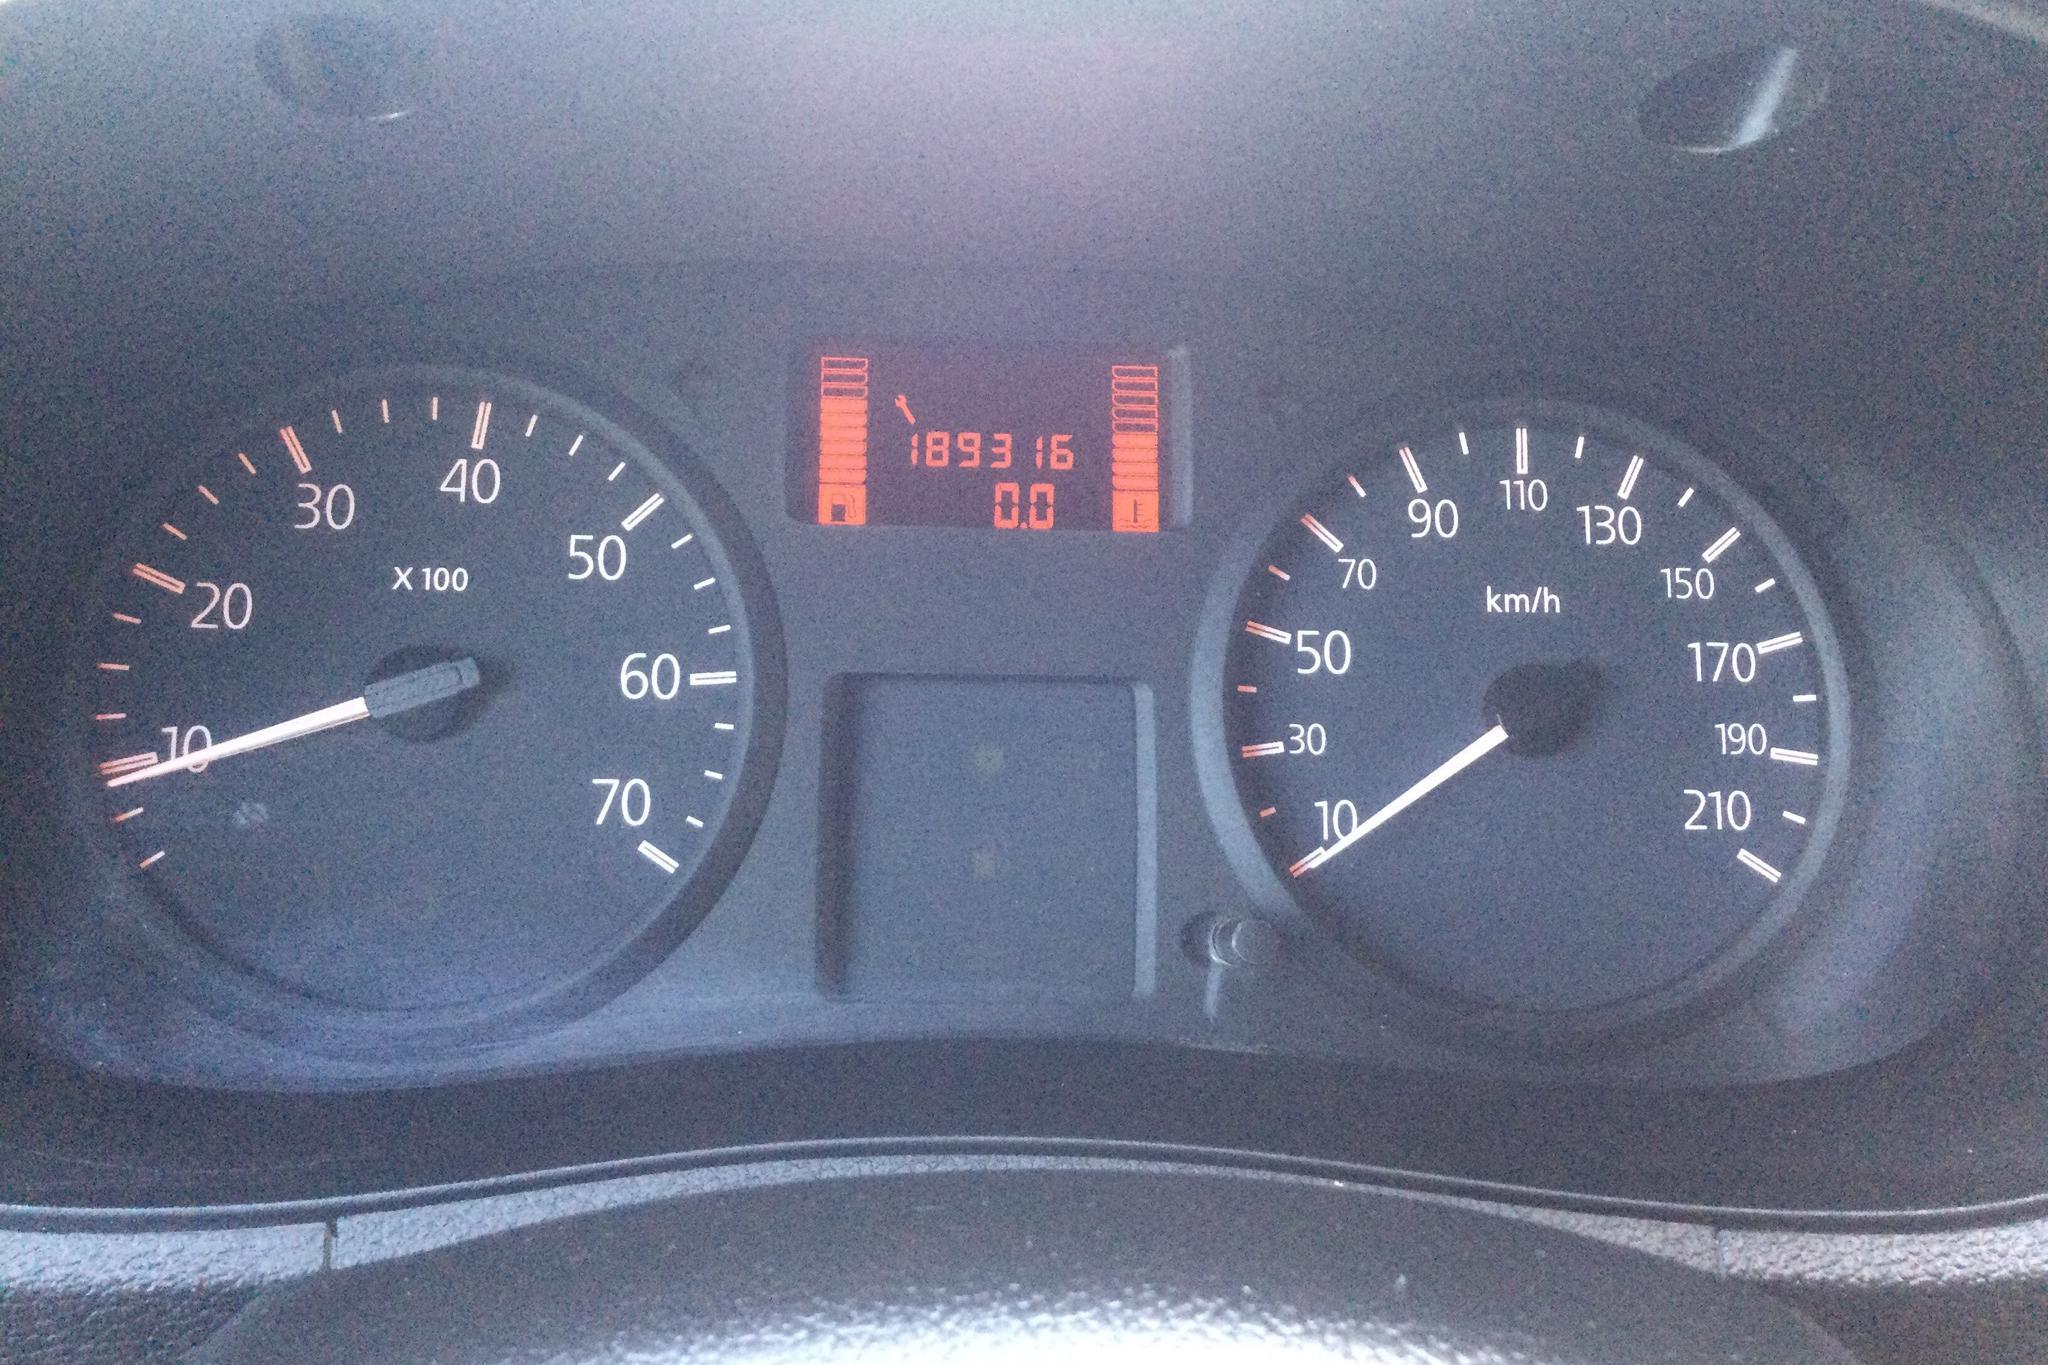 Renault Kangoo Express 1.5 dCi Skåp (65hk) - 18 931 mil - Manuell - Light Grey - 2008